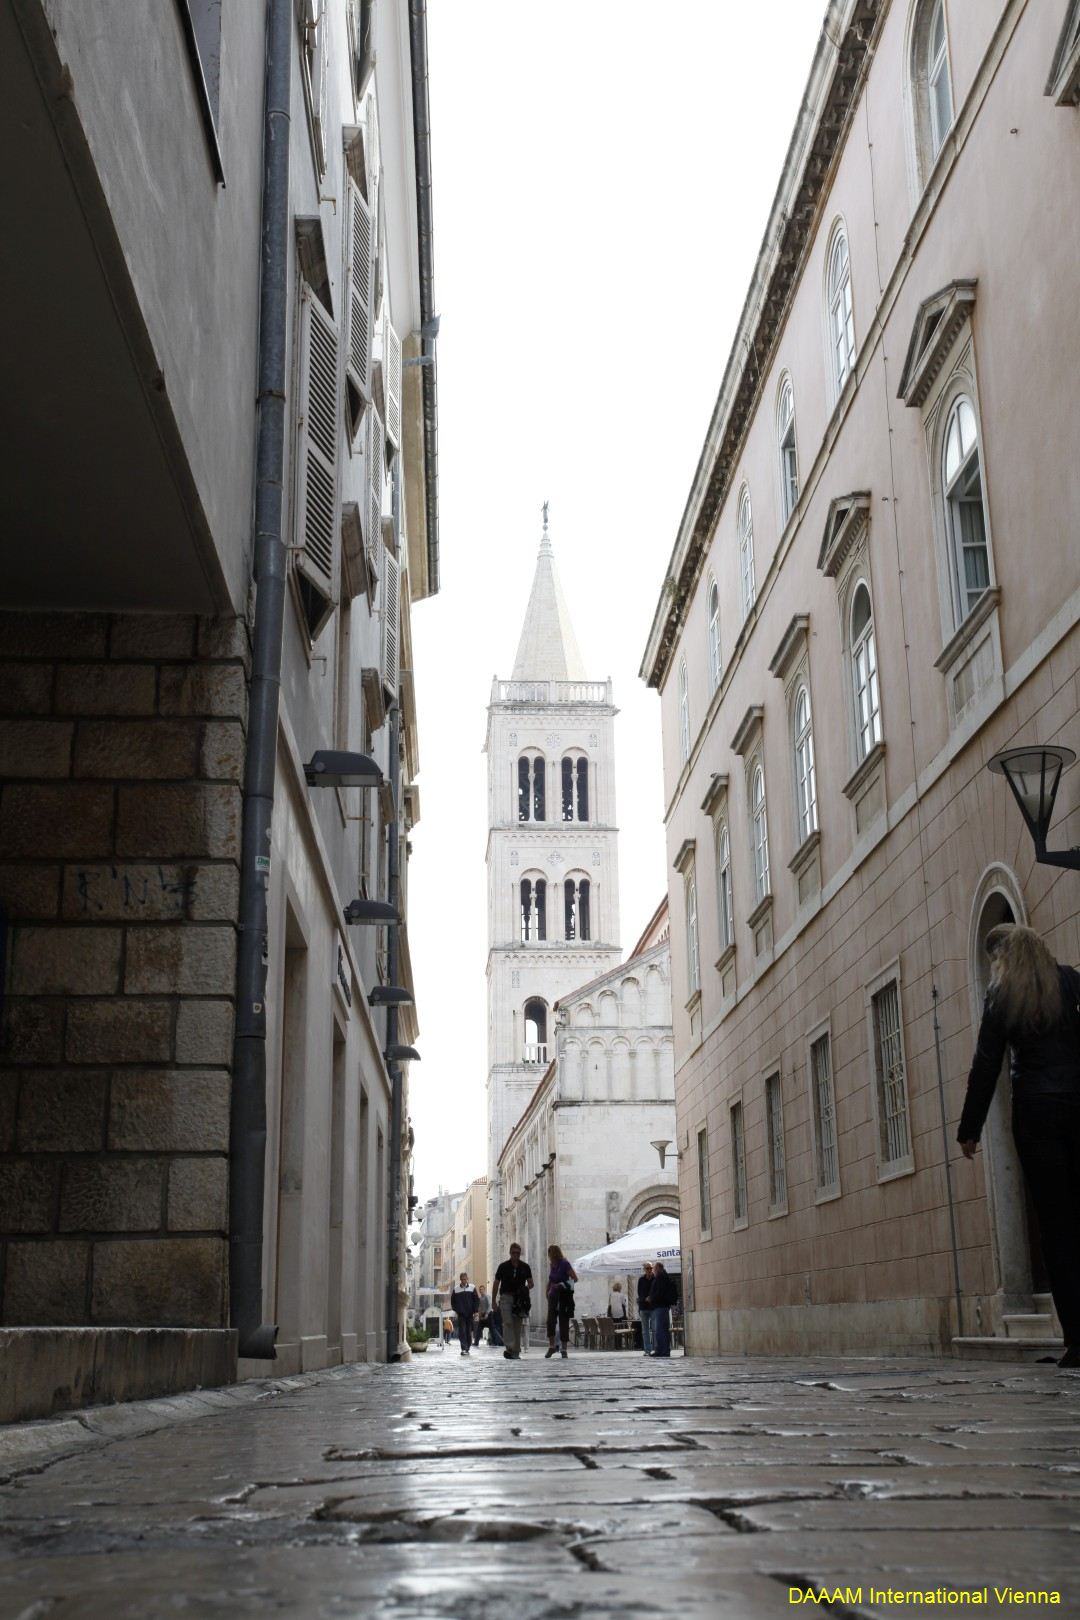 DAAAM_2012_Zadar_00_Zadar_City_049